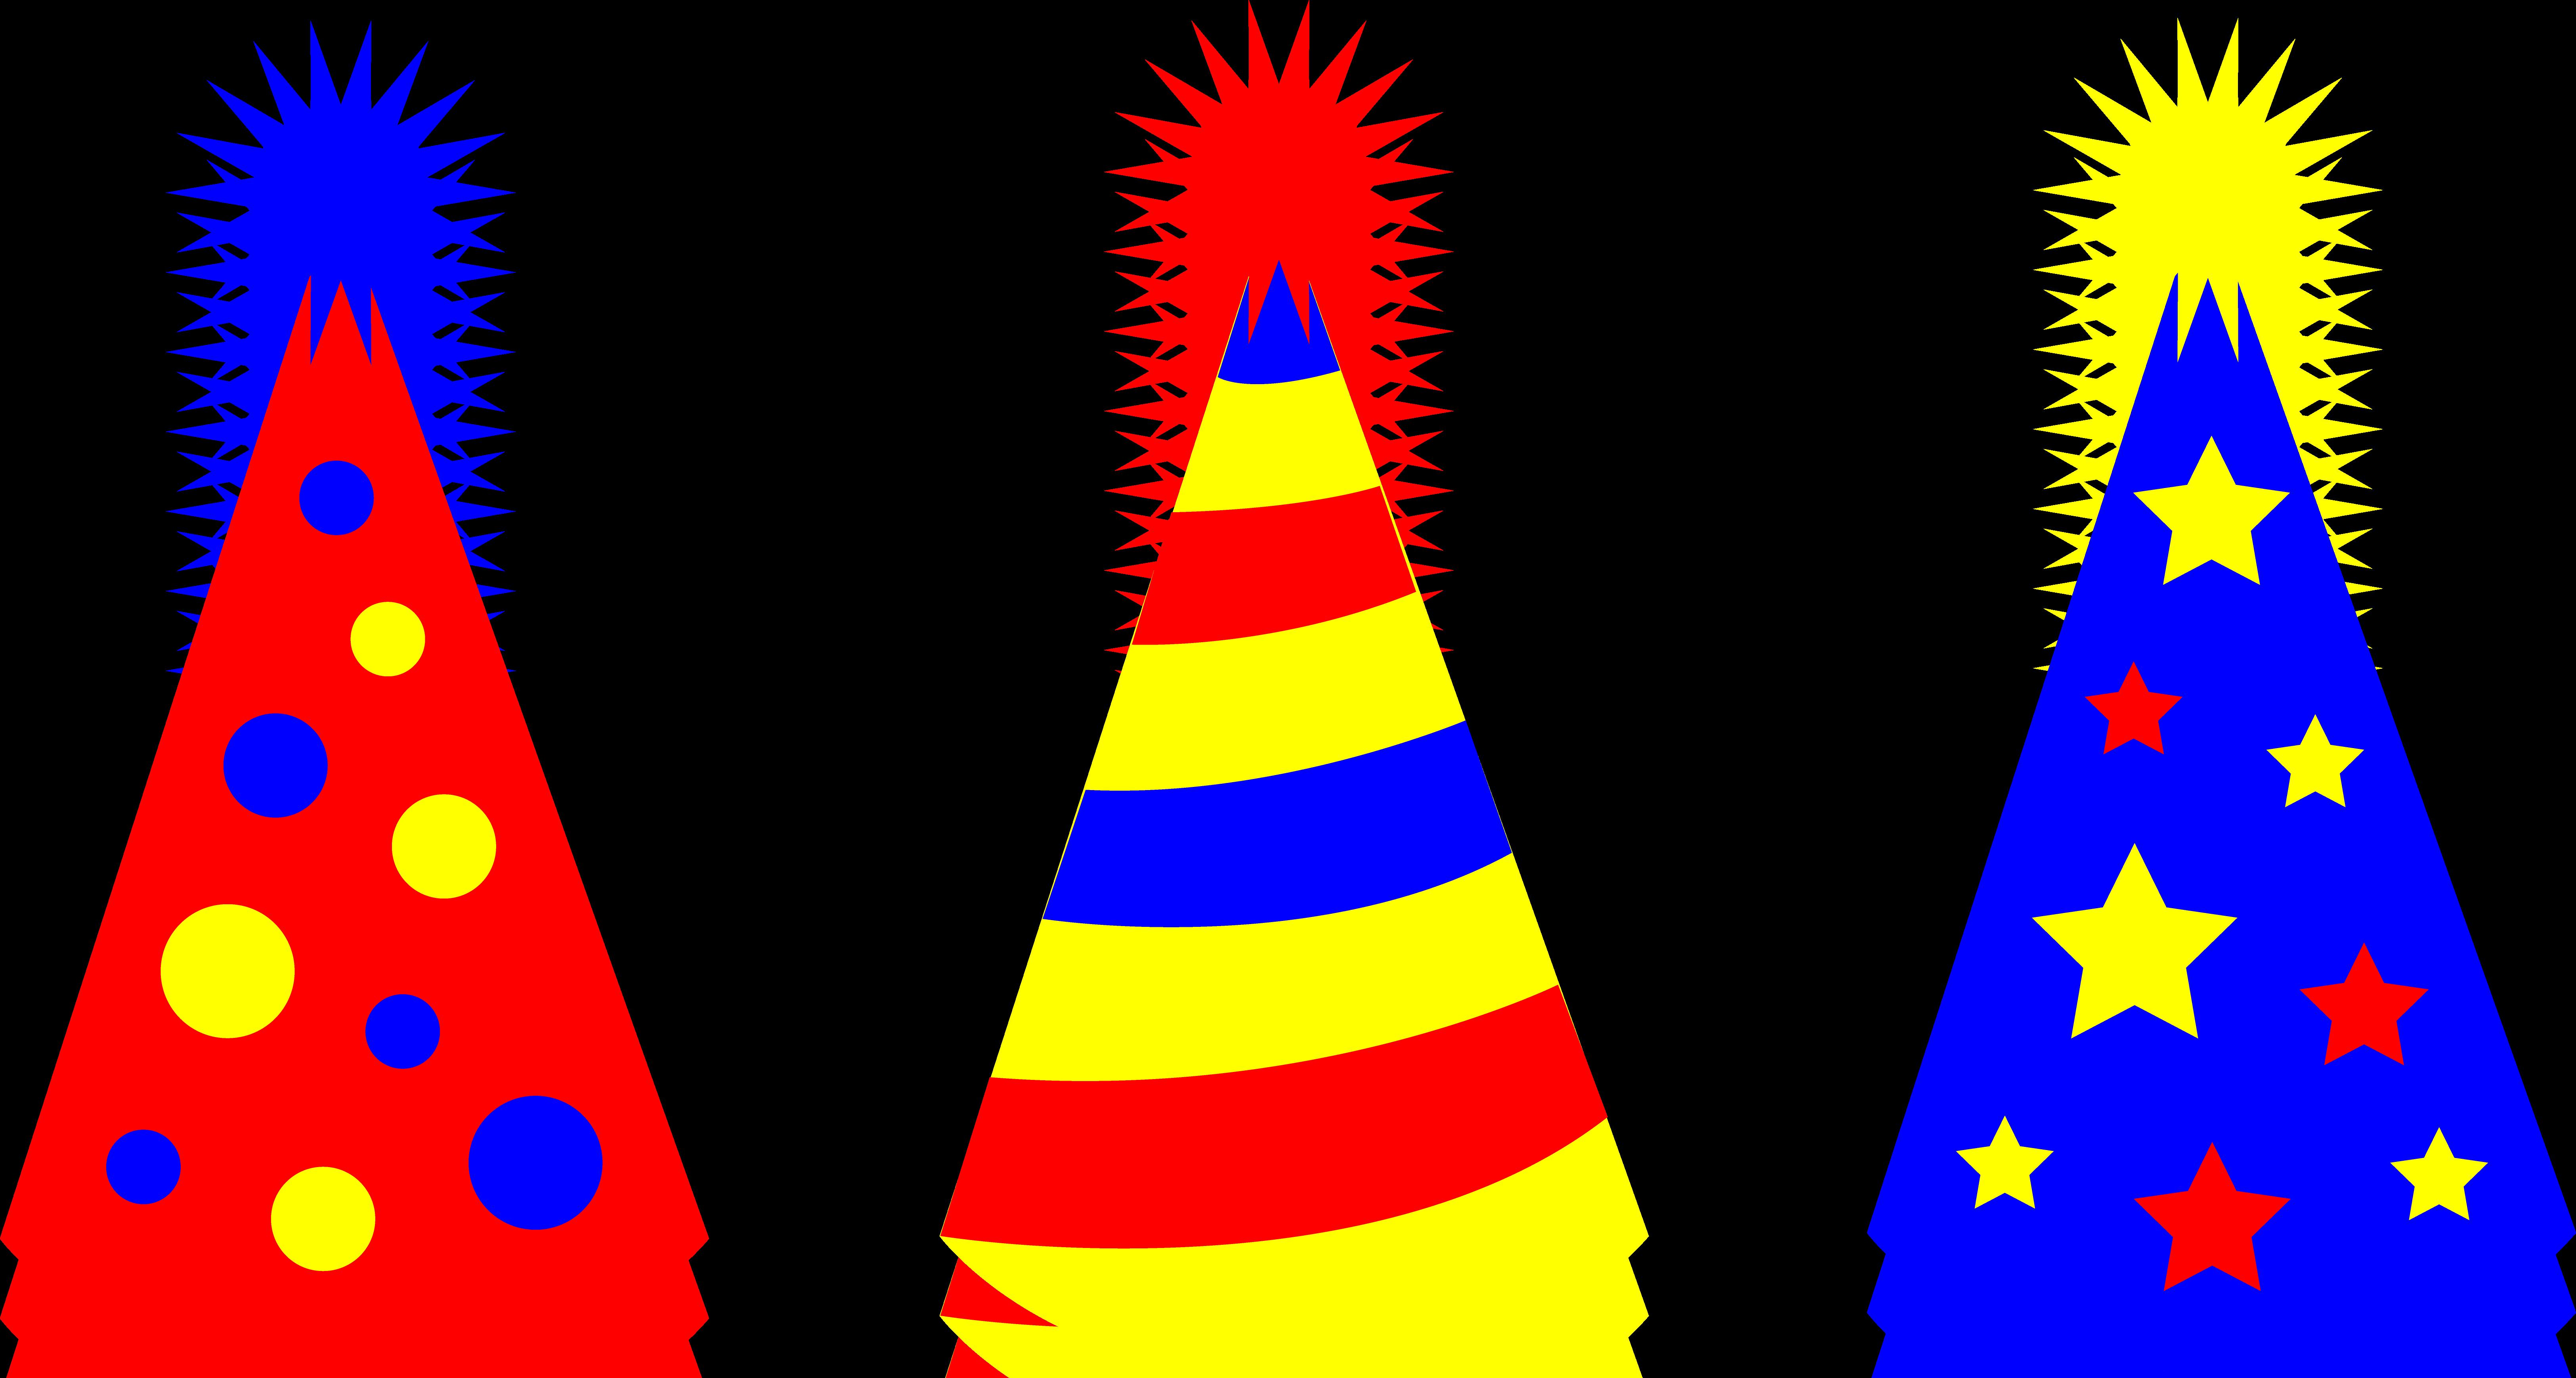 Party Hat Clipart Transparent Background